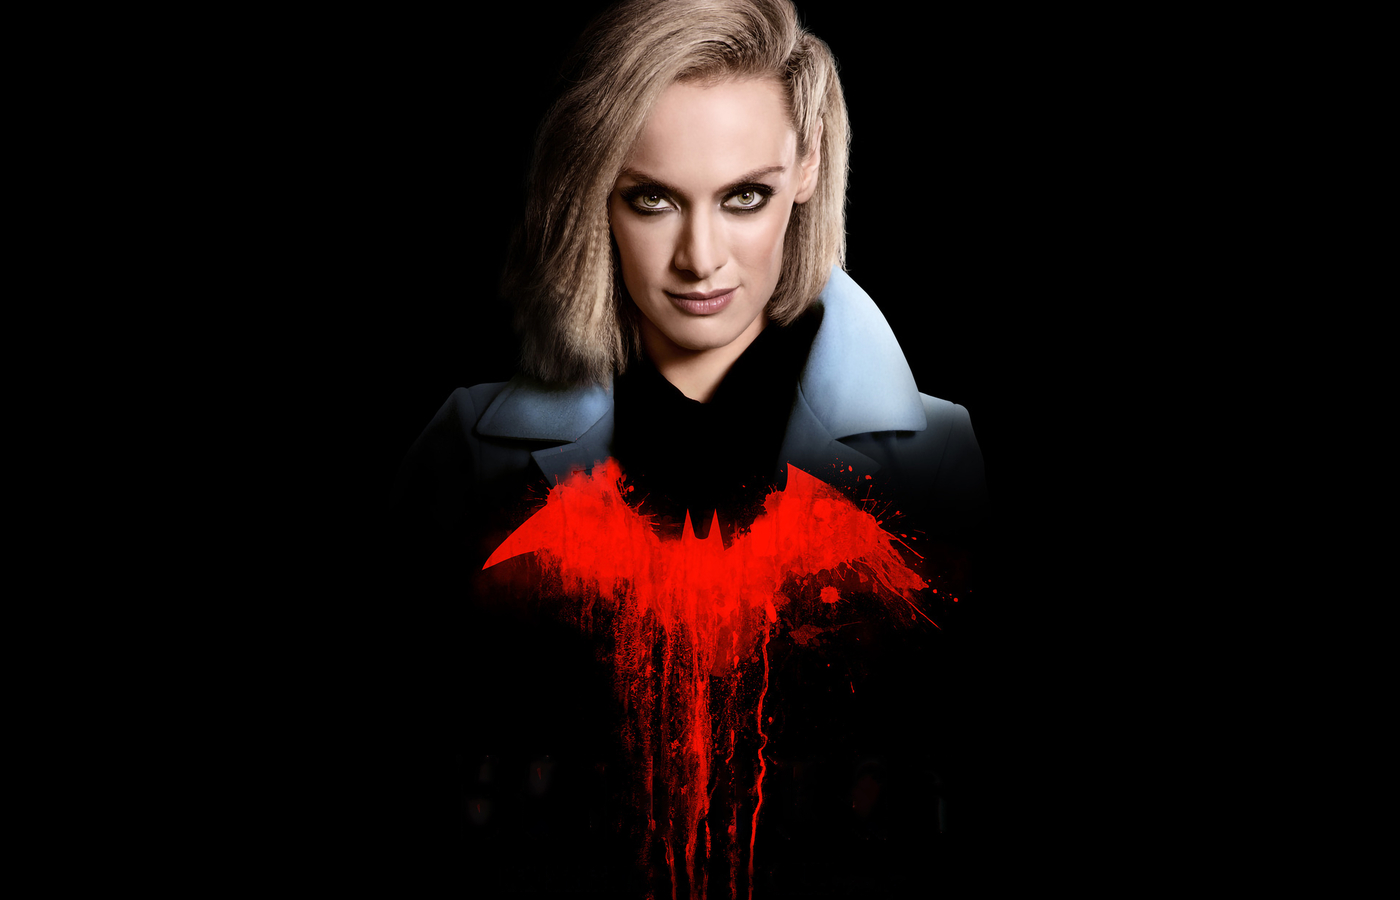 rachel-skarsten-as-alice-in-batwoman-mg.jpg